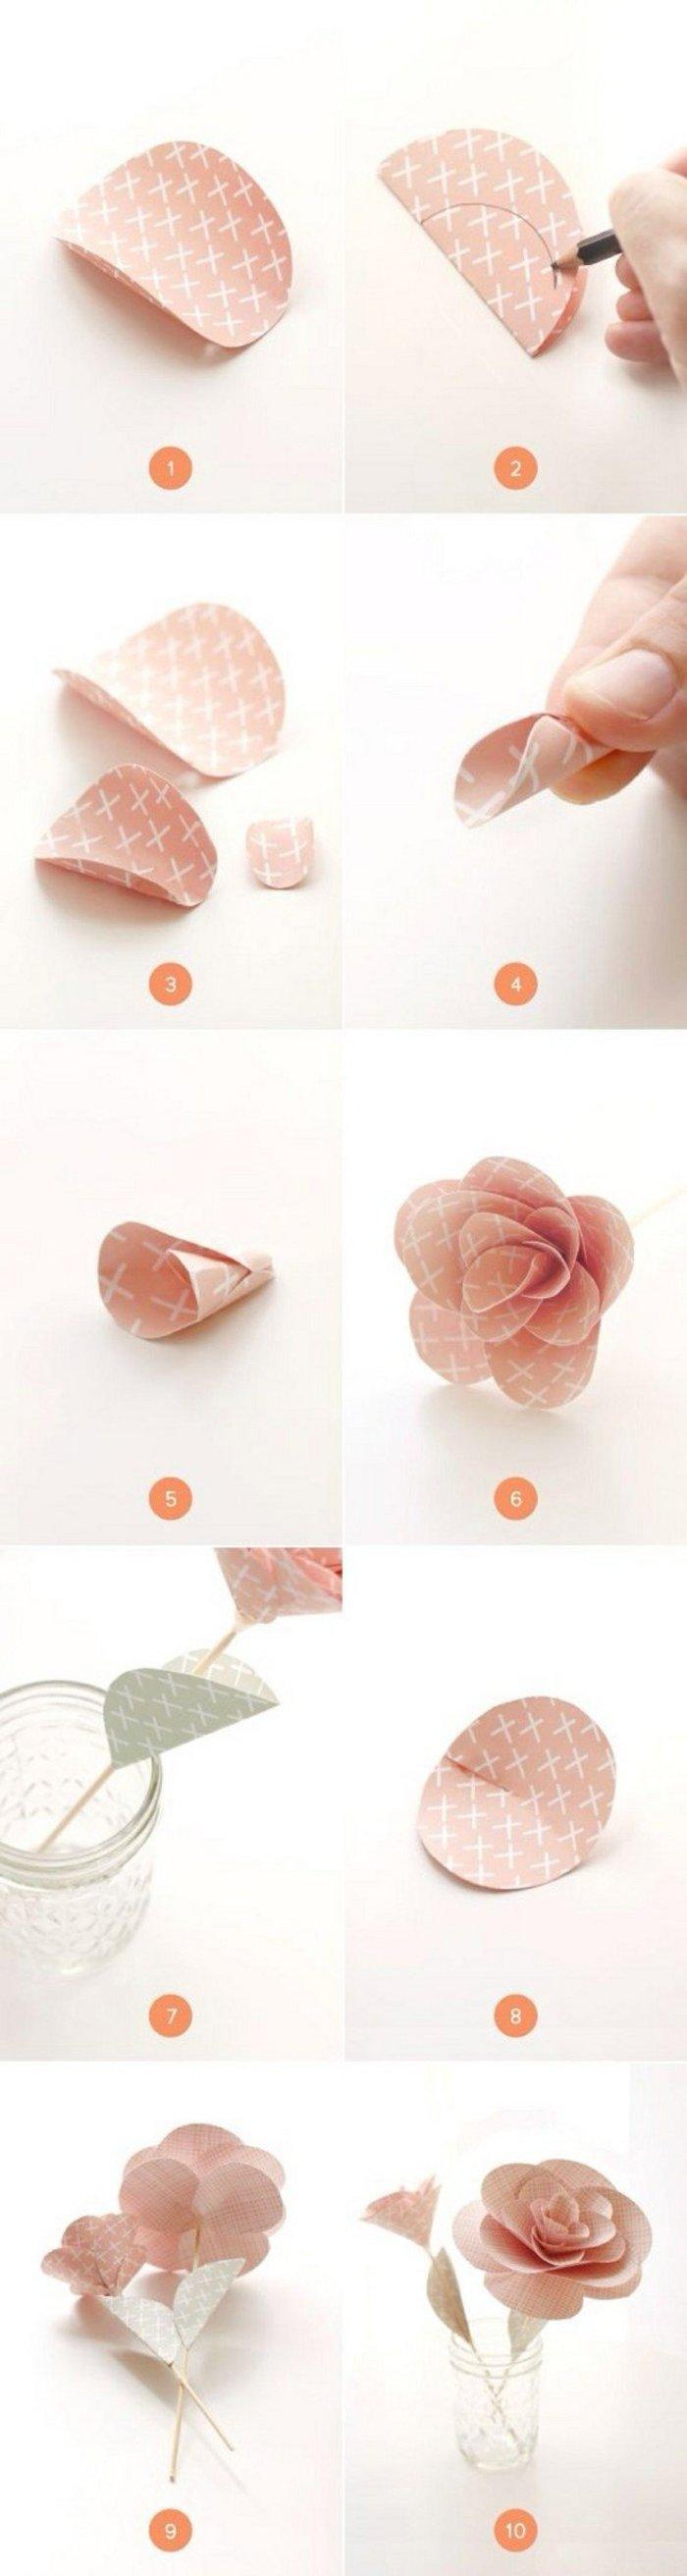 Simple origami flower rose branch tutorial diy pinterest simple origami flower rose branch tutorial mightylinksfo